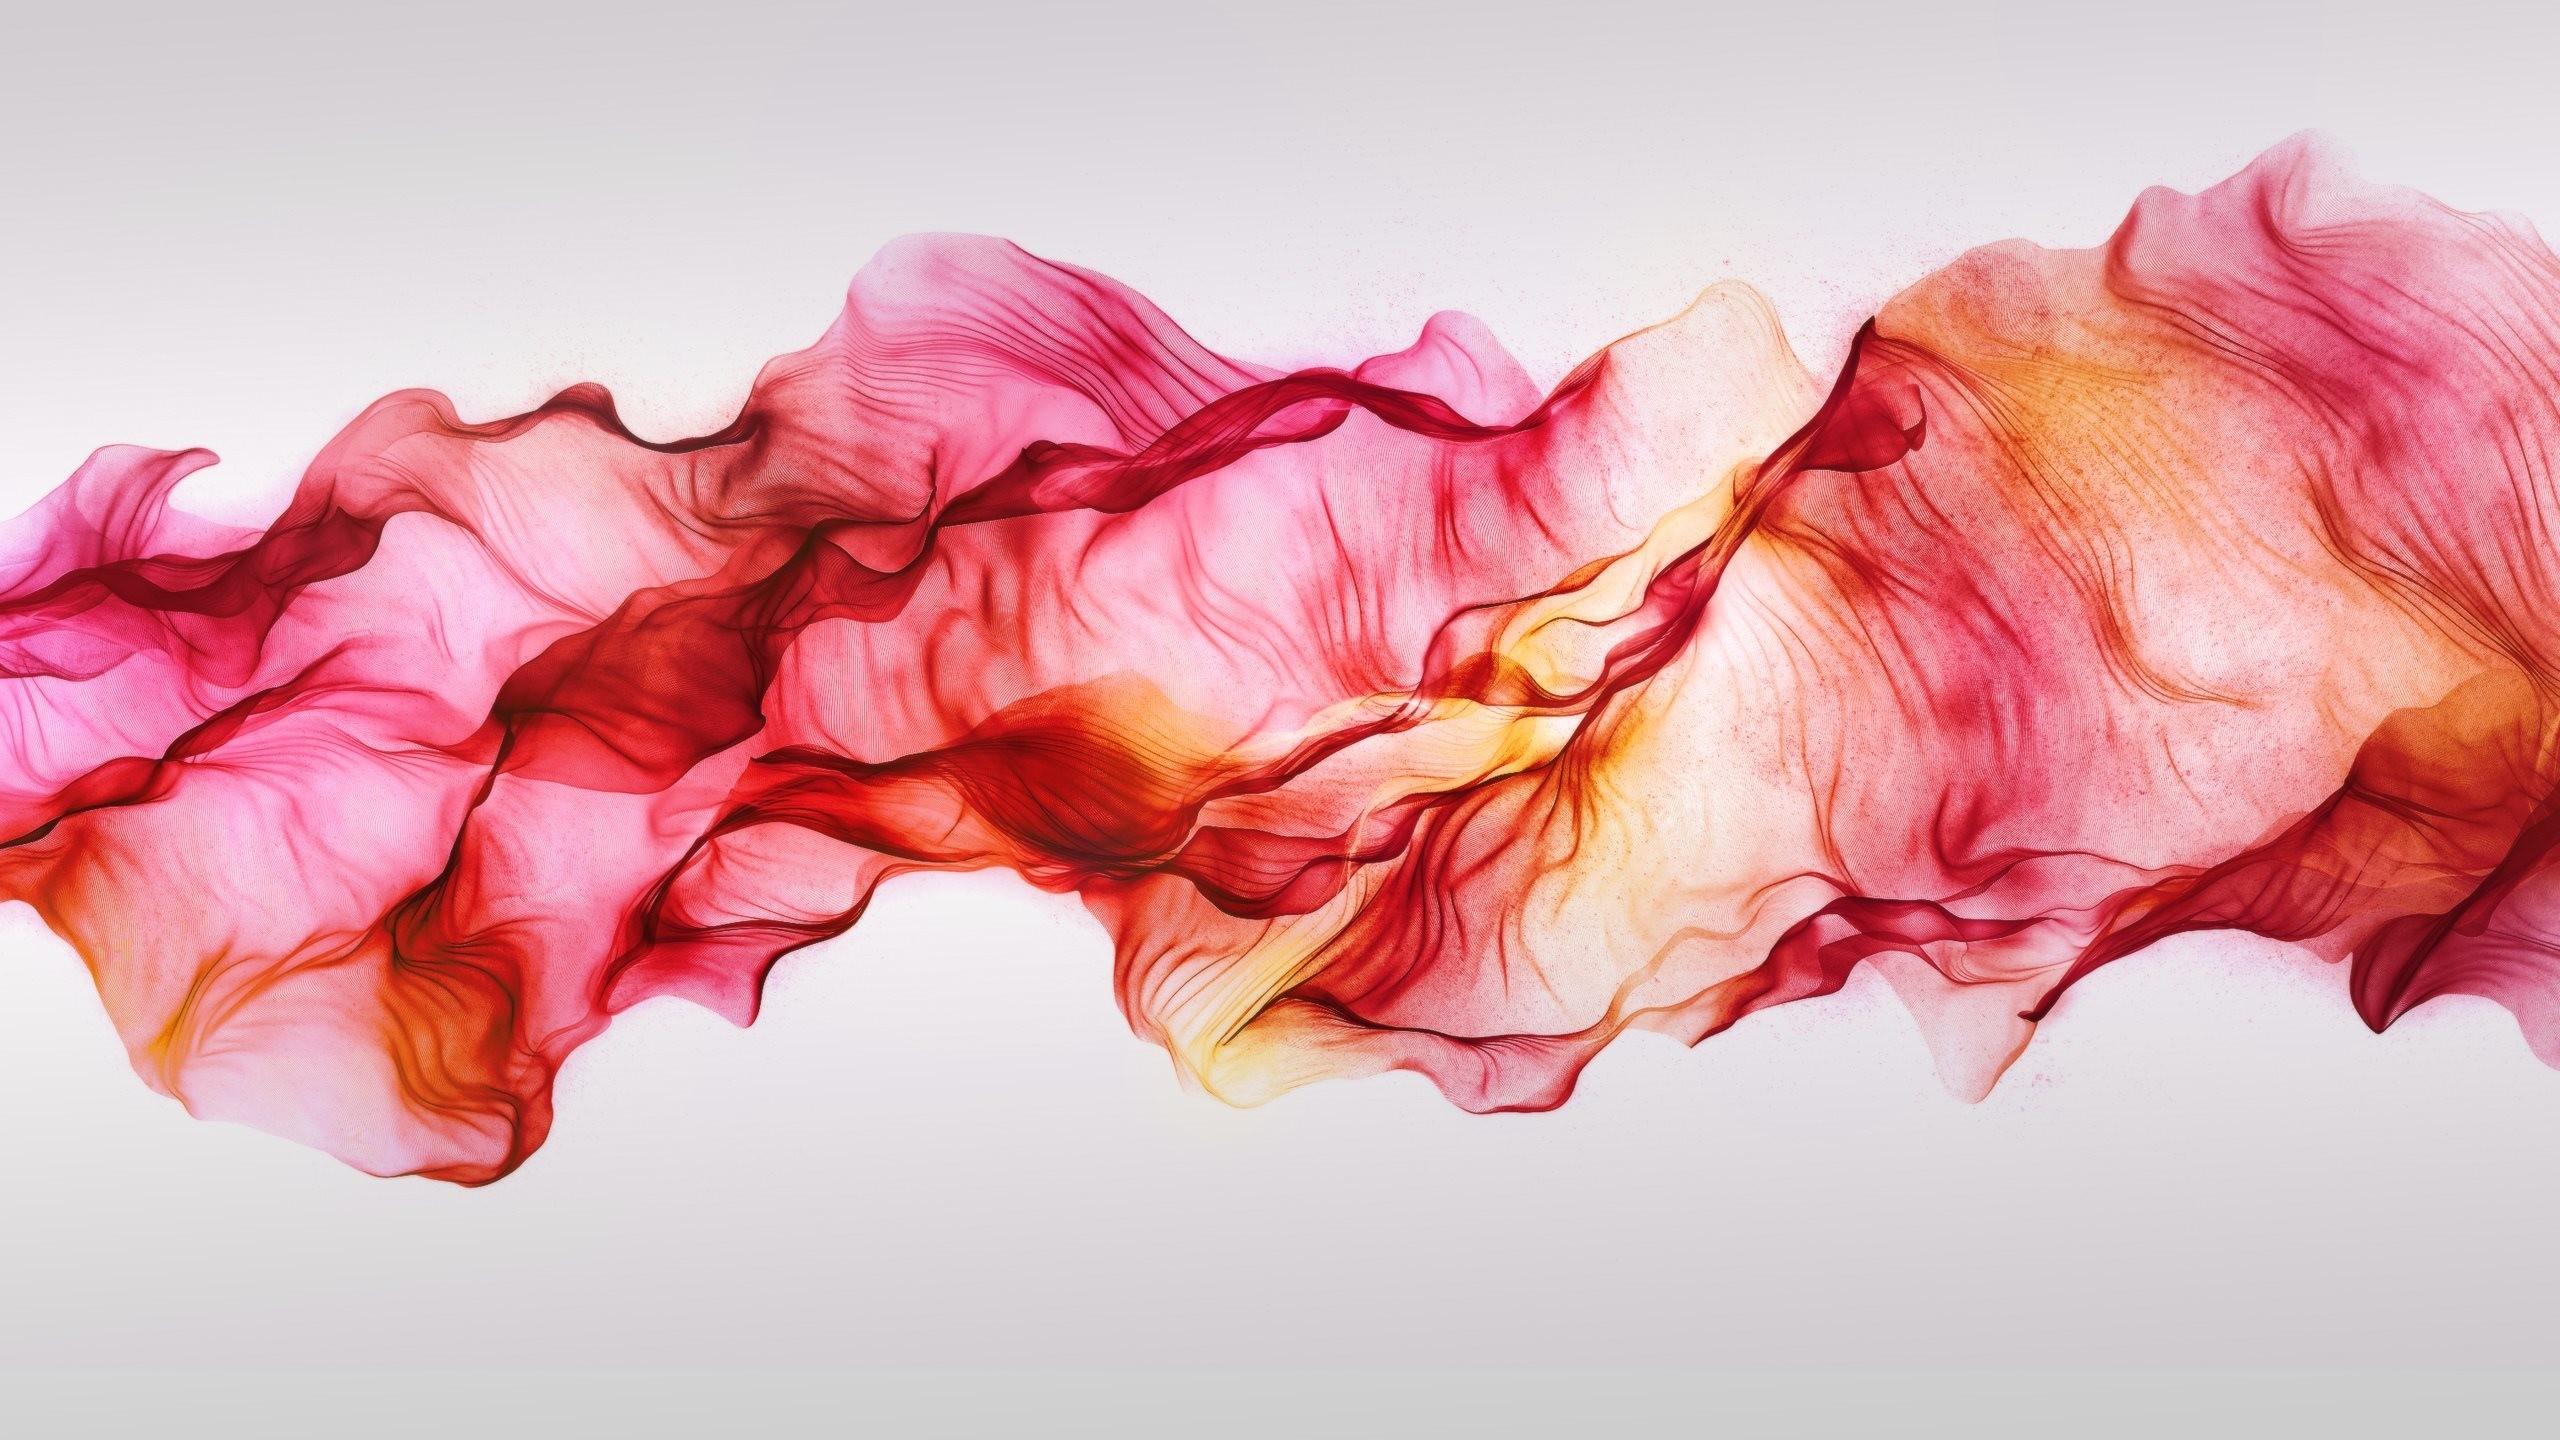 colored smoke wallpaper ·①